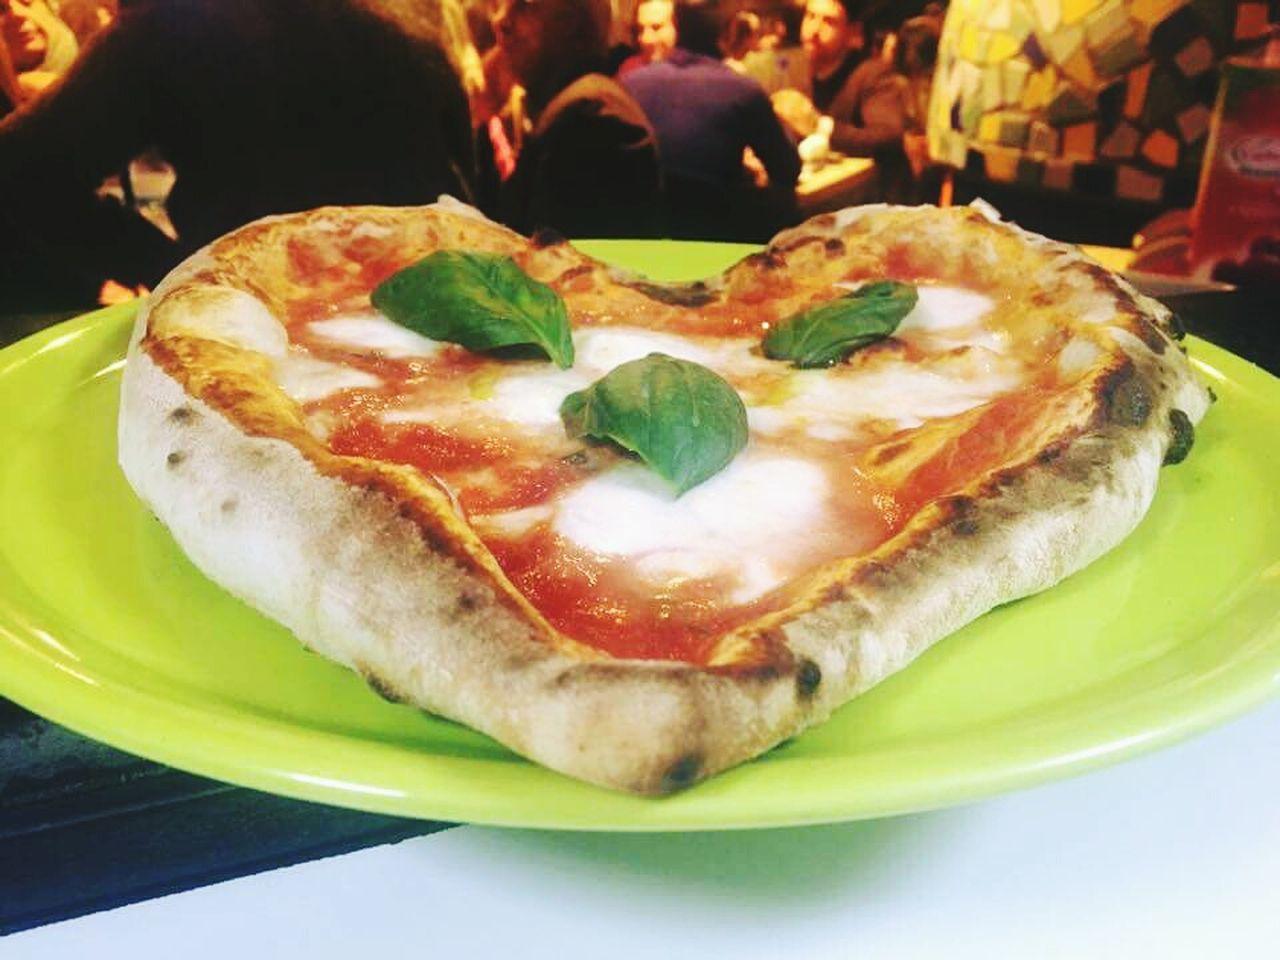 Happy S.valentine Food And Drink Eyeem Food  Food Porn Italia Foodart Onelove♥ IlovePIZZA Pizza Italian Food No People Day